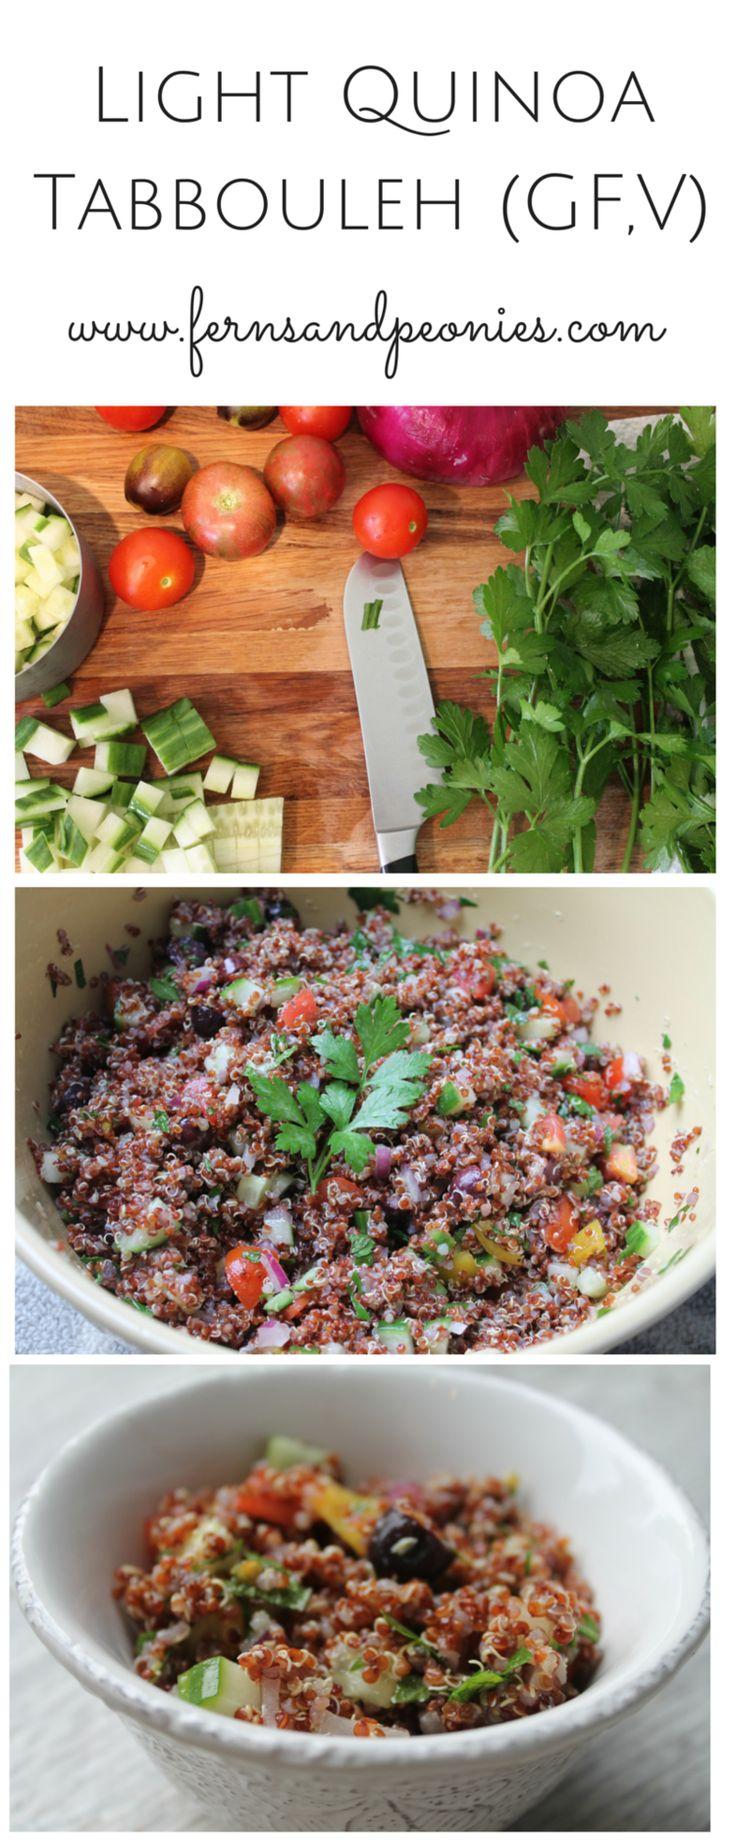 ... ™ Recipes on Pinterest | 8 week challenge, Quinoa salad and Quinoa